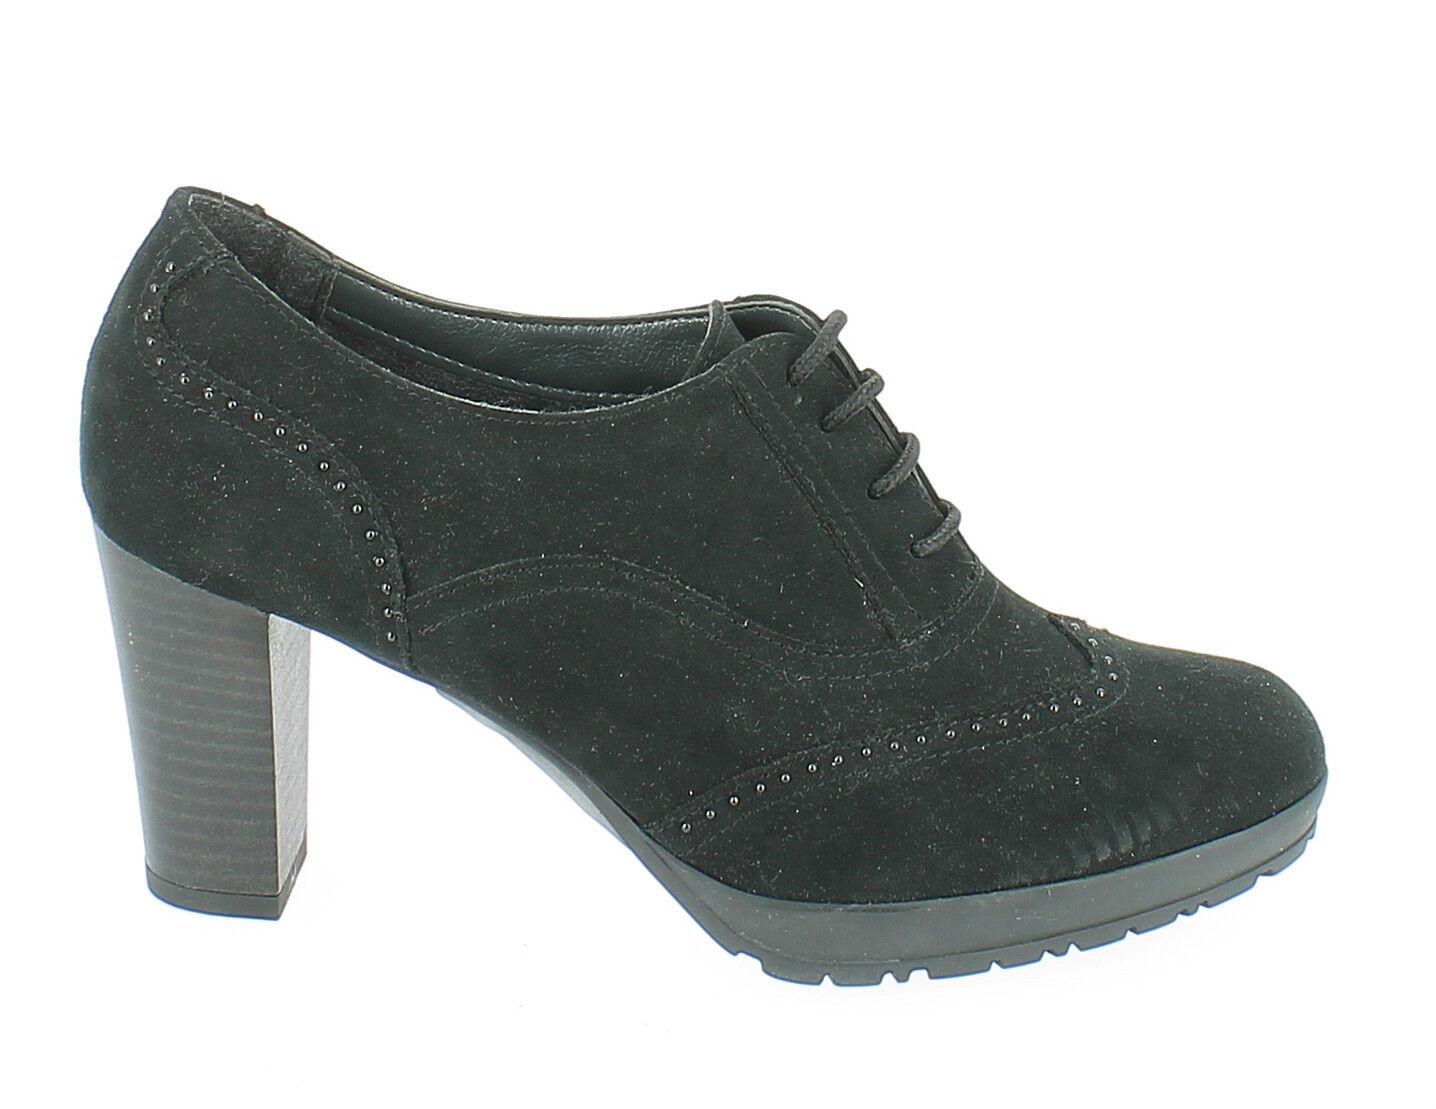 CINZIA SOFT 352337 NEGRO O/I zapatos botín bajo mujer ante zapatillas oxford